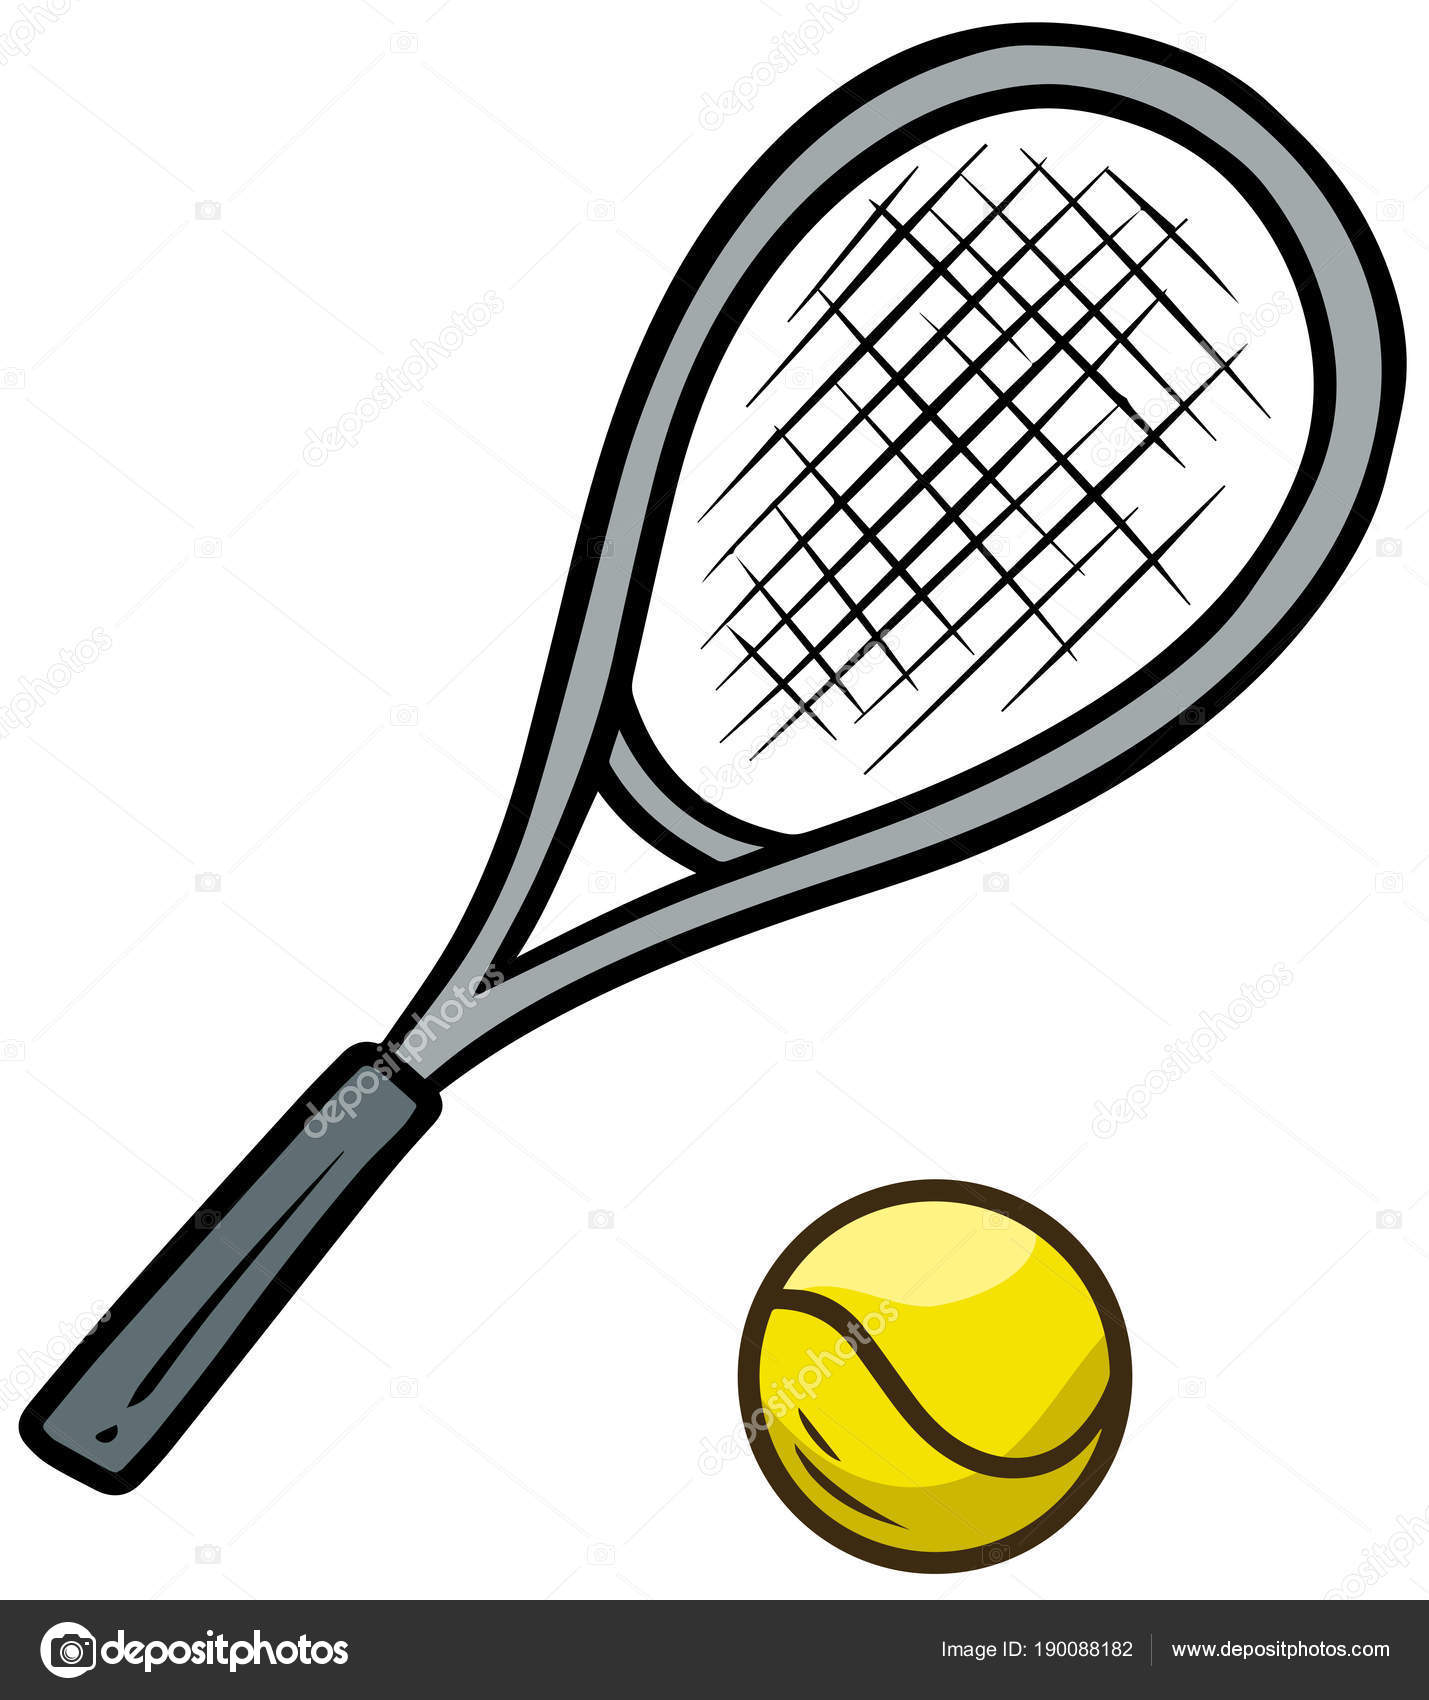 Cartoon tennisschl ger und gelben ball stockvektor gb - Raquette dessin ...